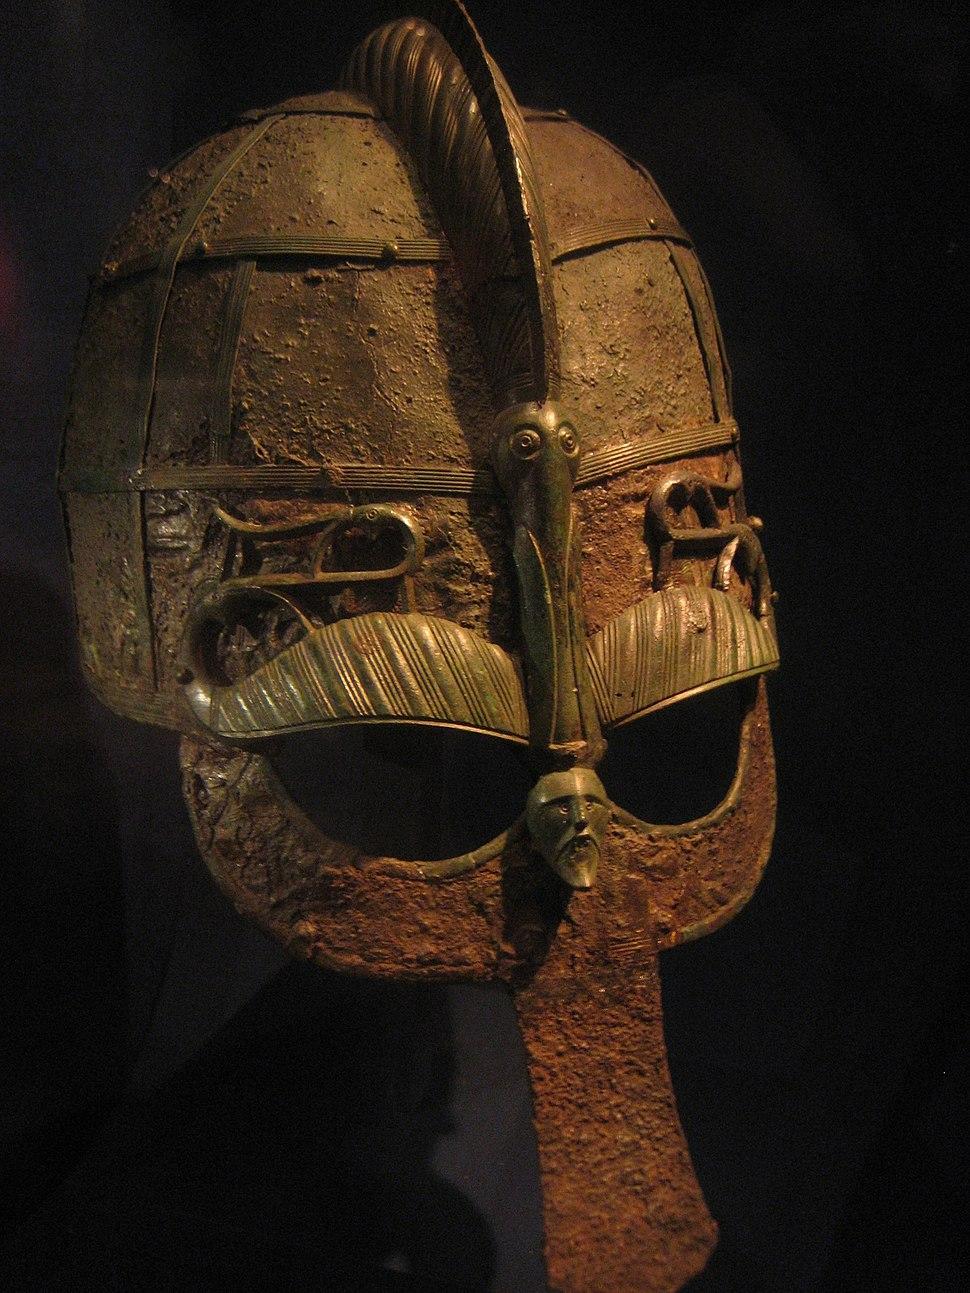 Helmet from a 7th century boat grave, Vendel era